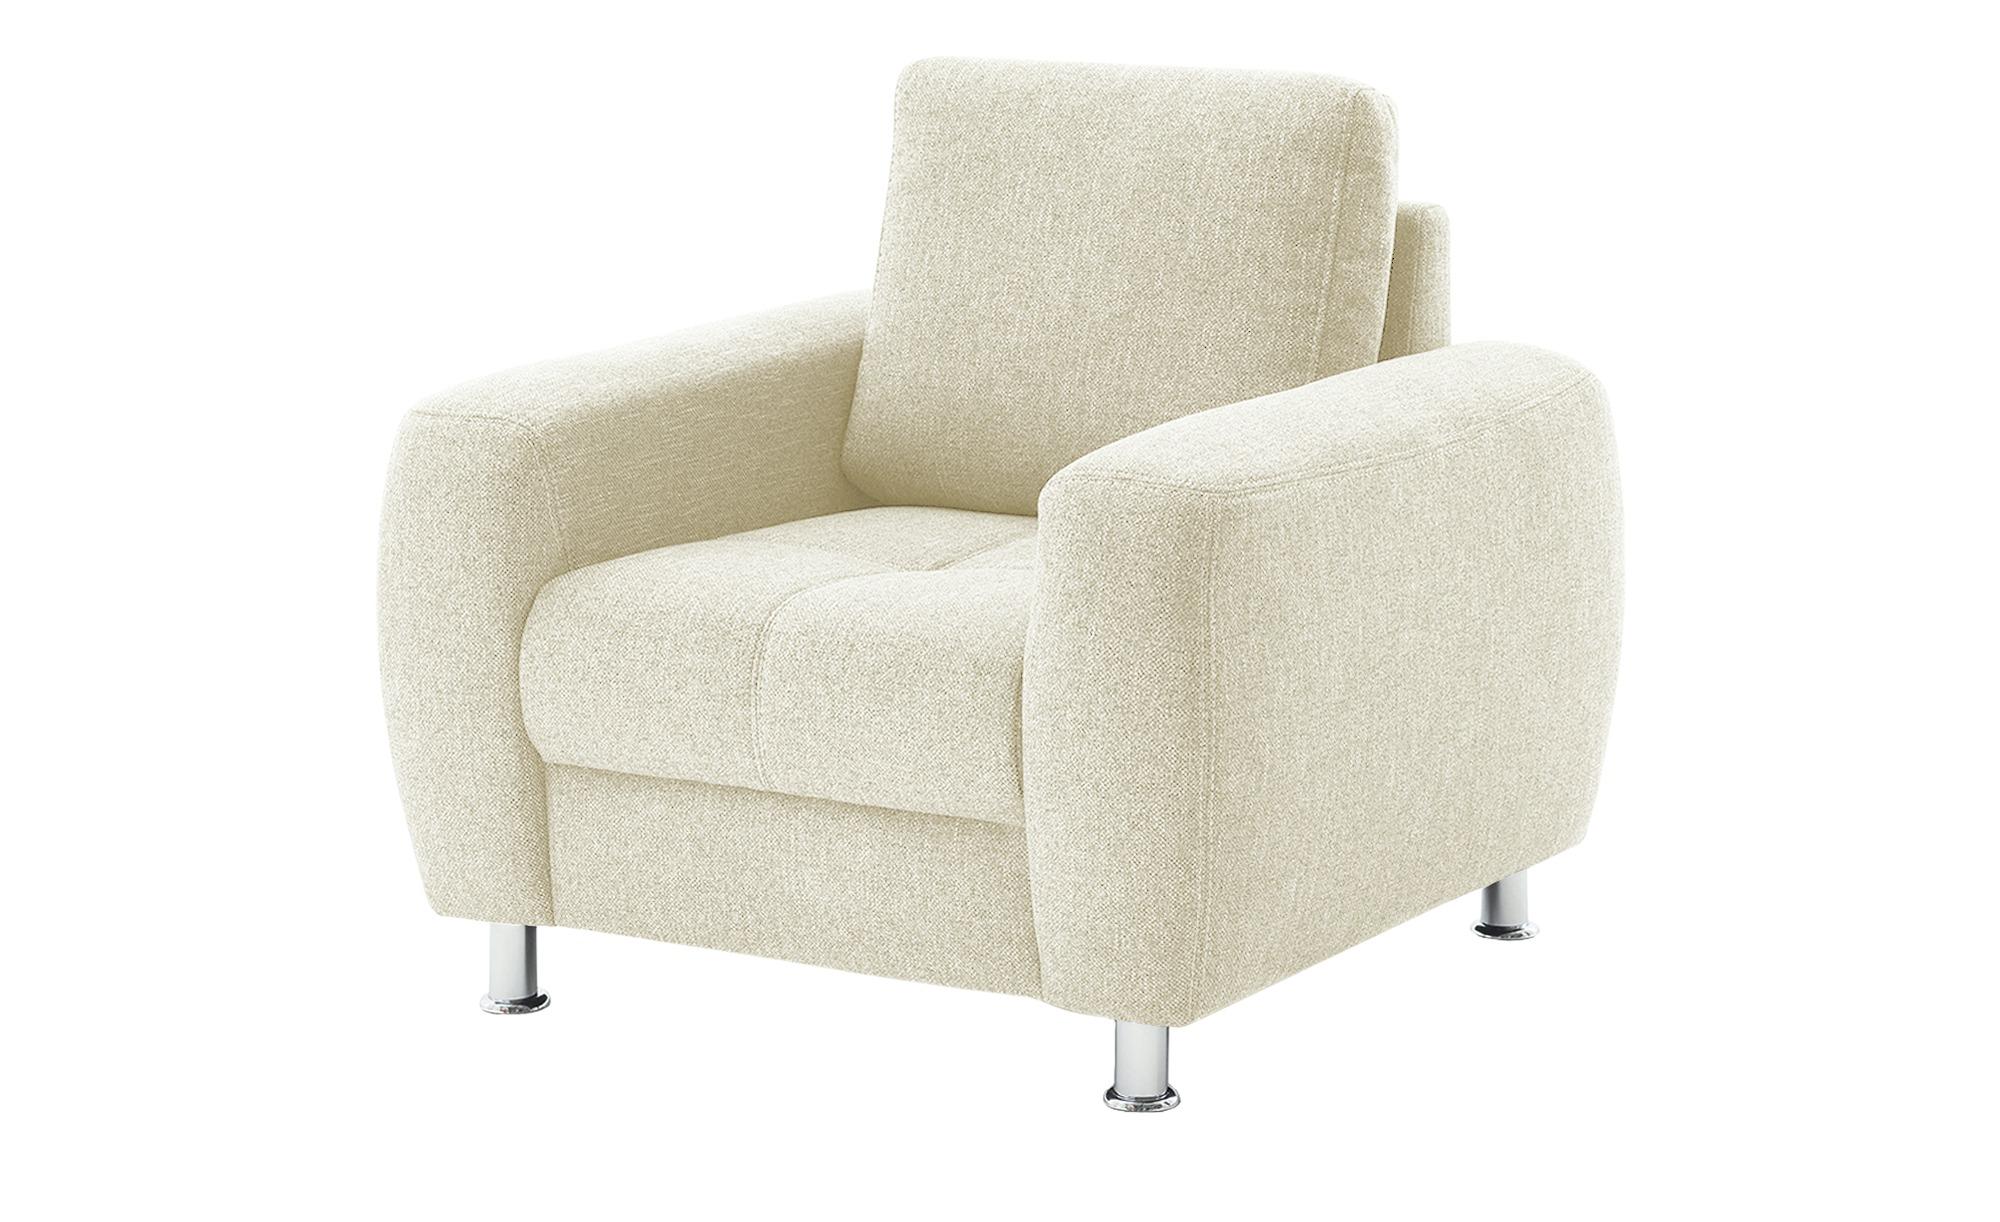 bobb Sessel  Giulia ¦ creme ¦ Maße (cm): B: 97 H: 92 T: 95 Polstermöbel > Sessel > Polstersessel - Höffner